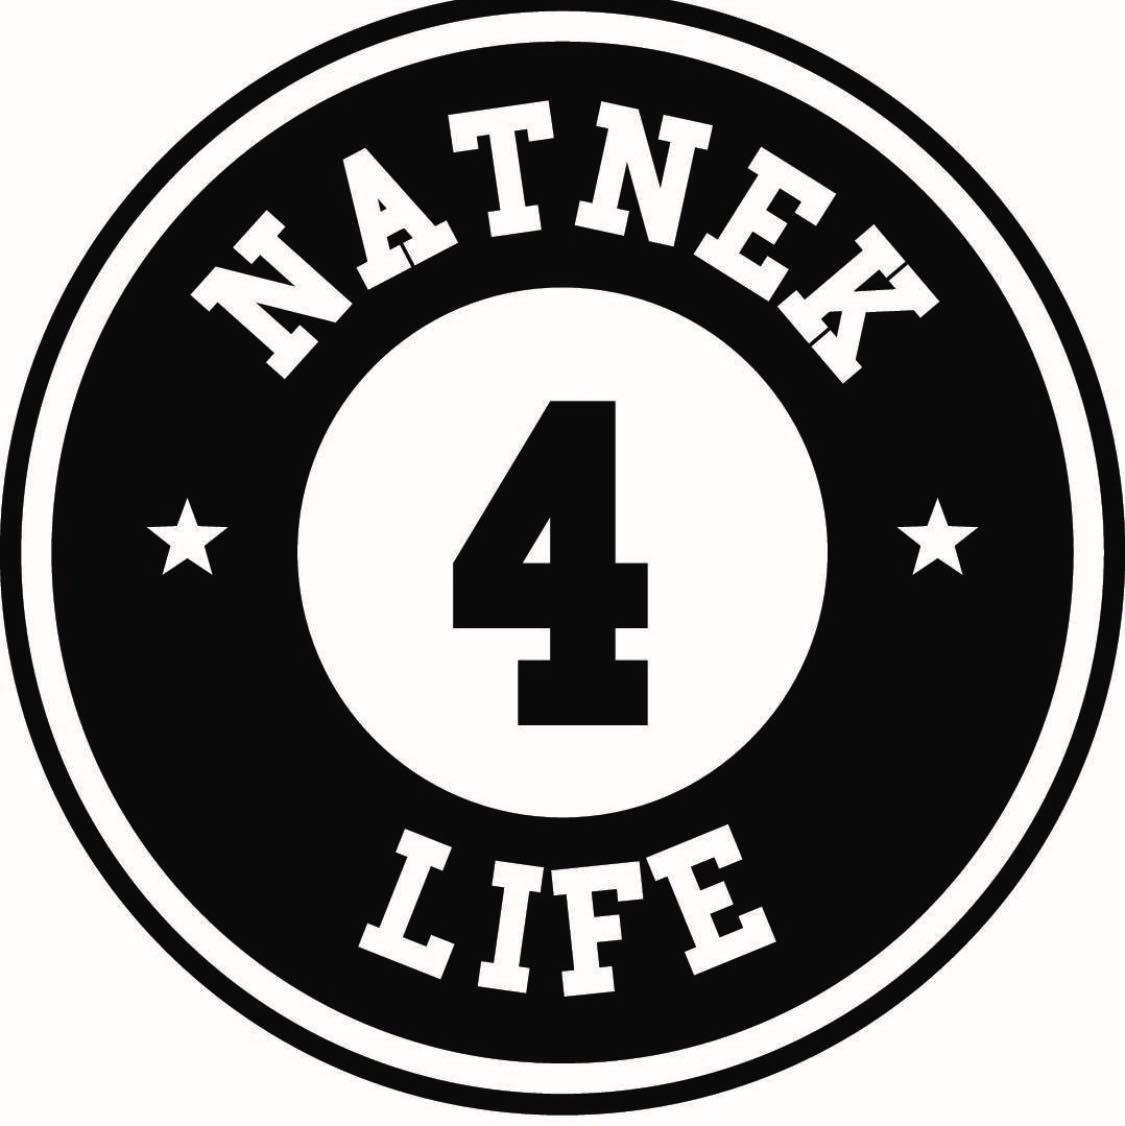 Originele Natnek trainingspak - Man